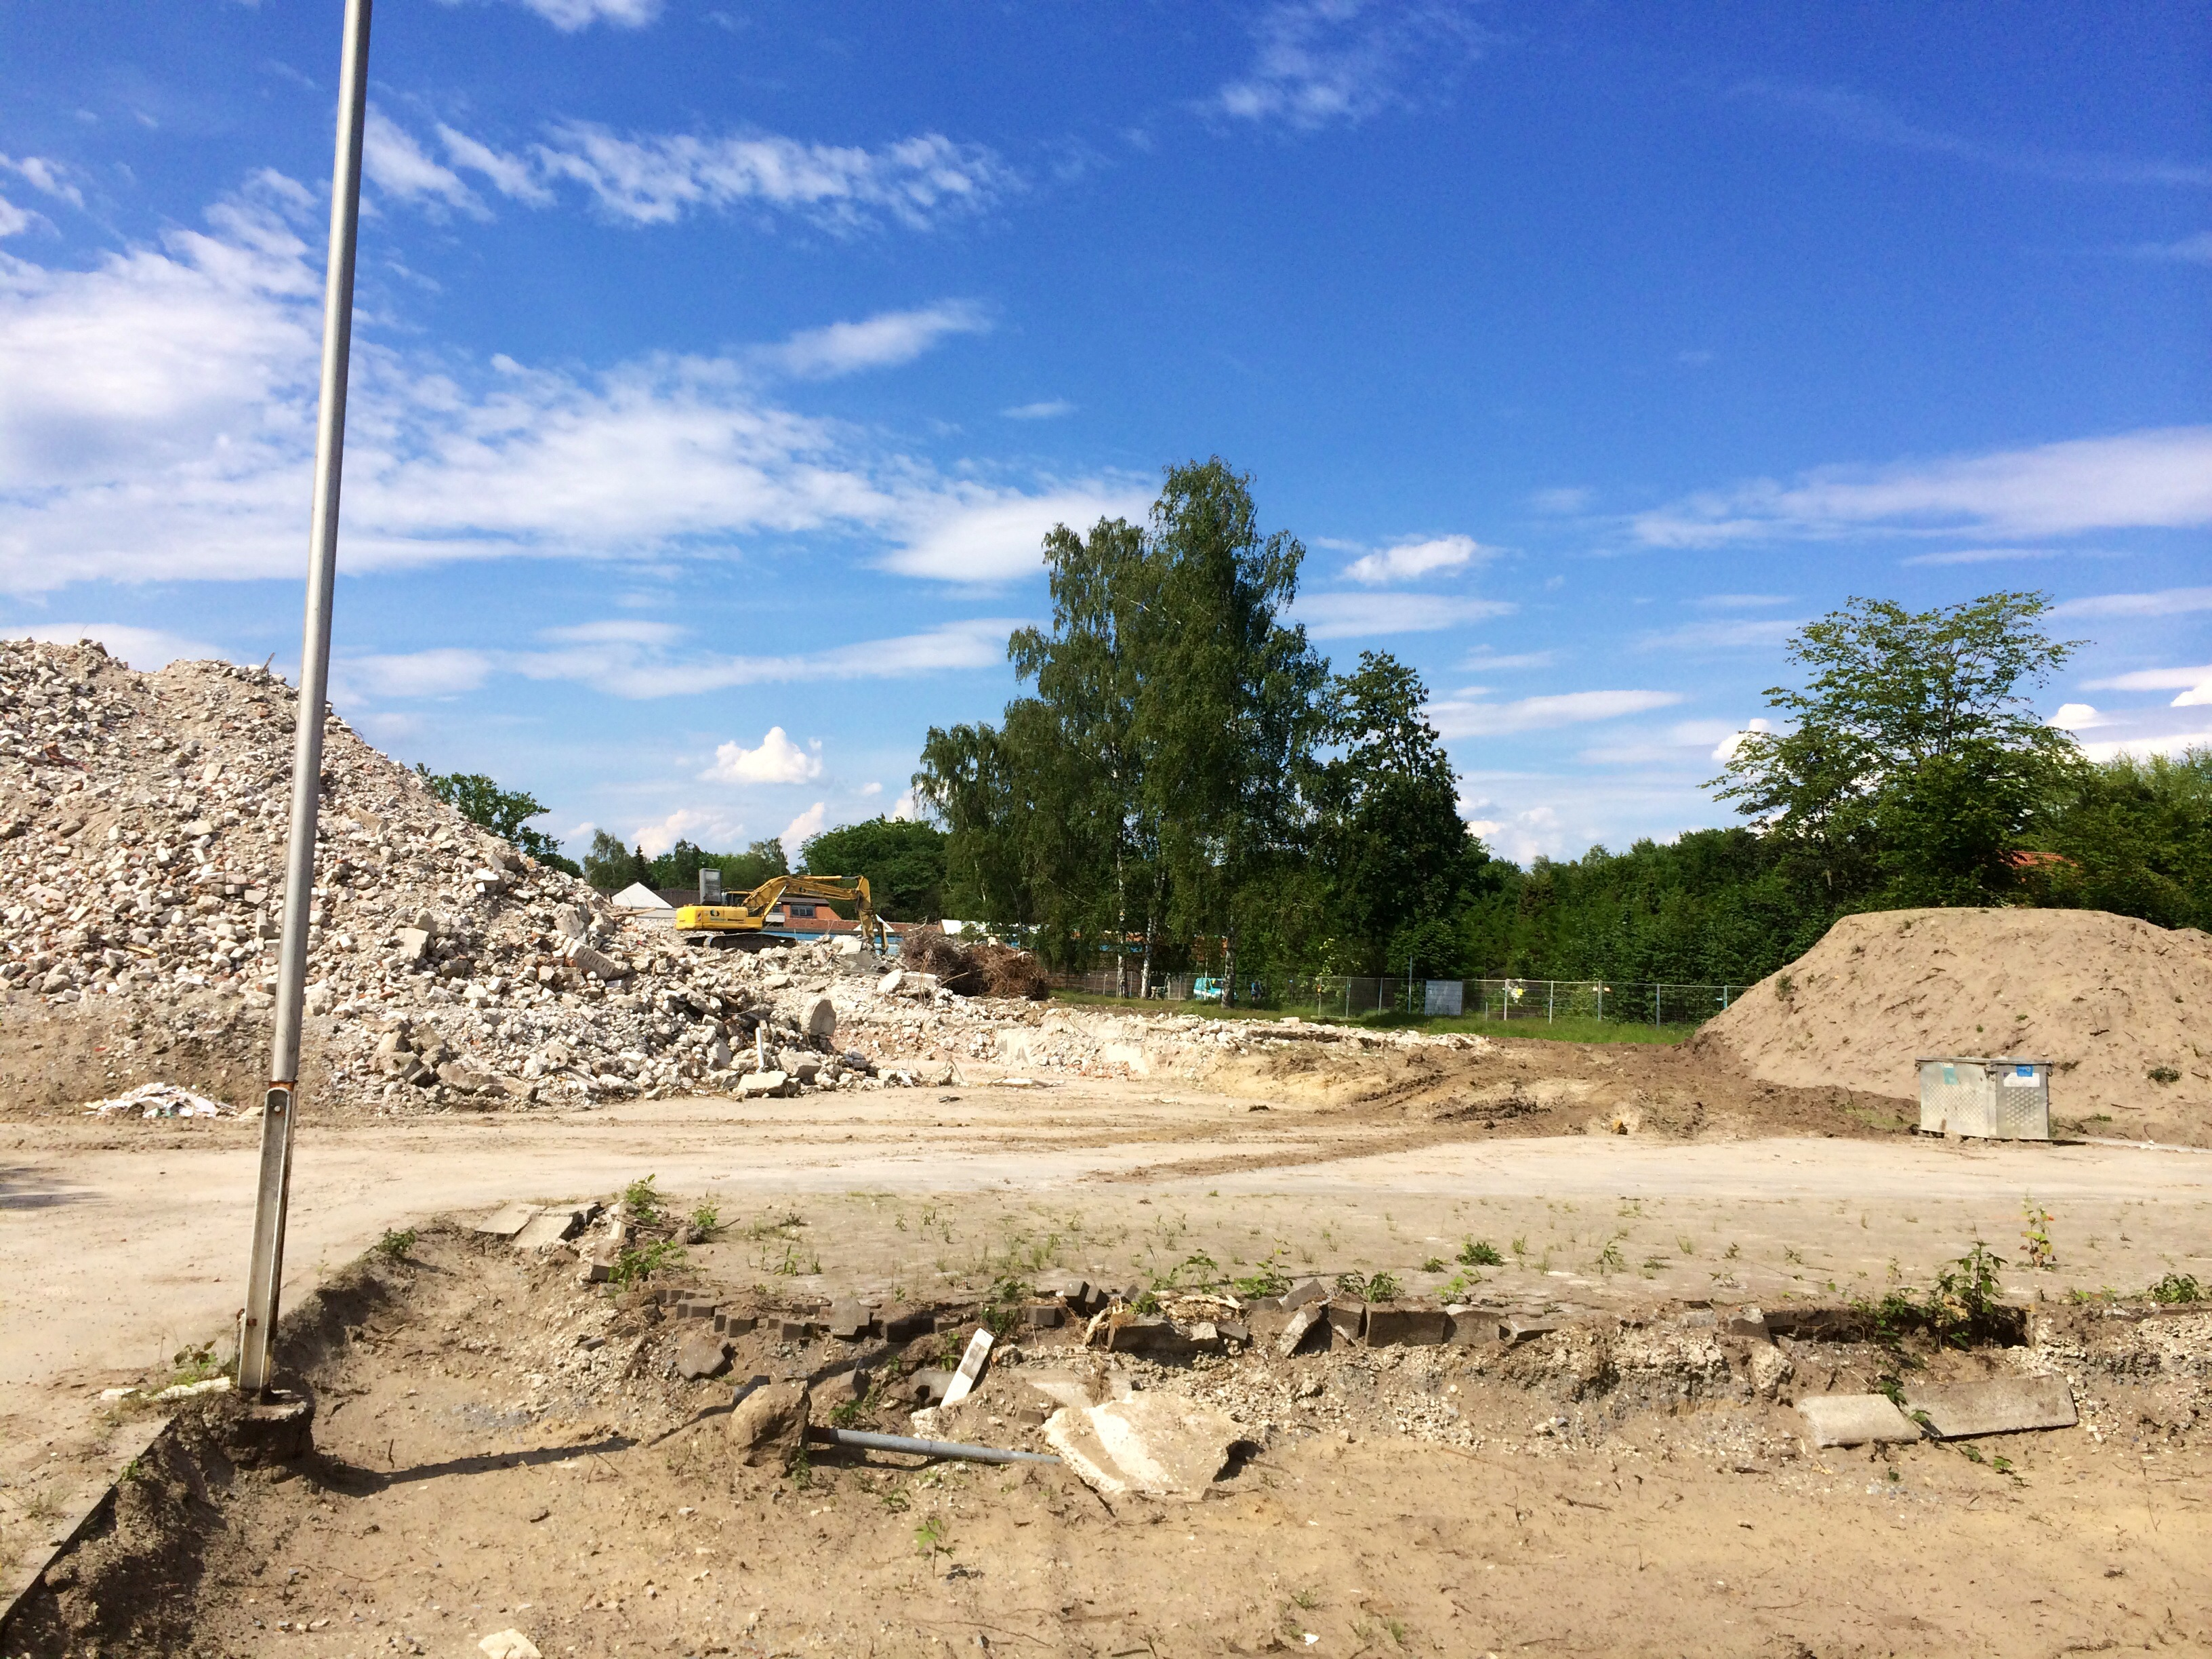 Schutthalde der Kreuzkampklinik Lippstadt Bad Waldliesborn